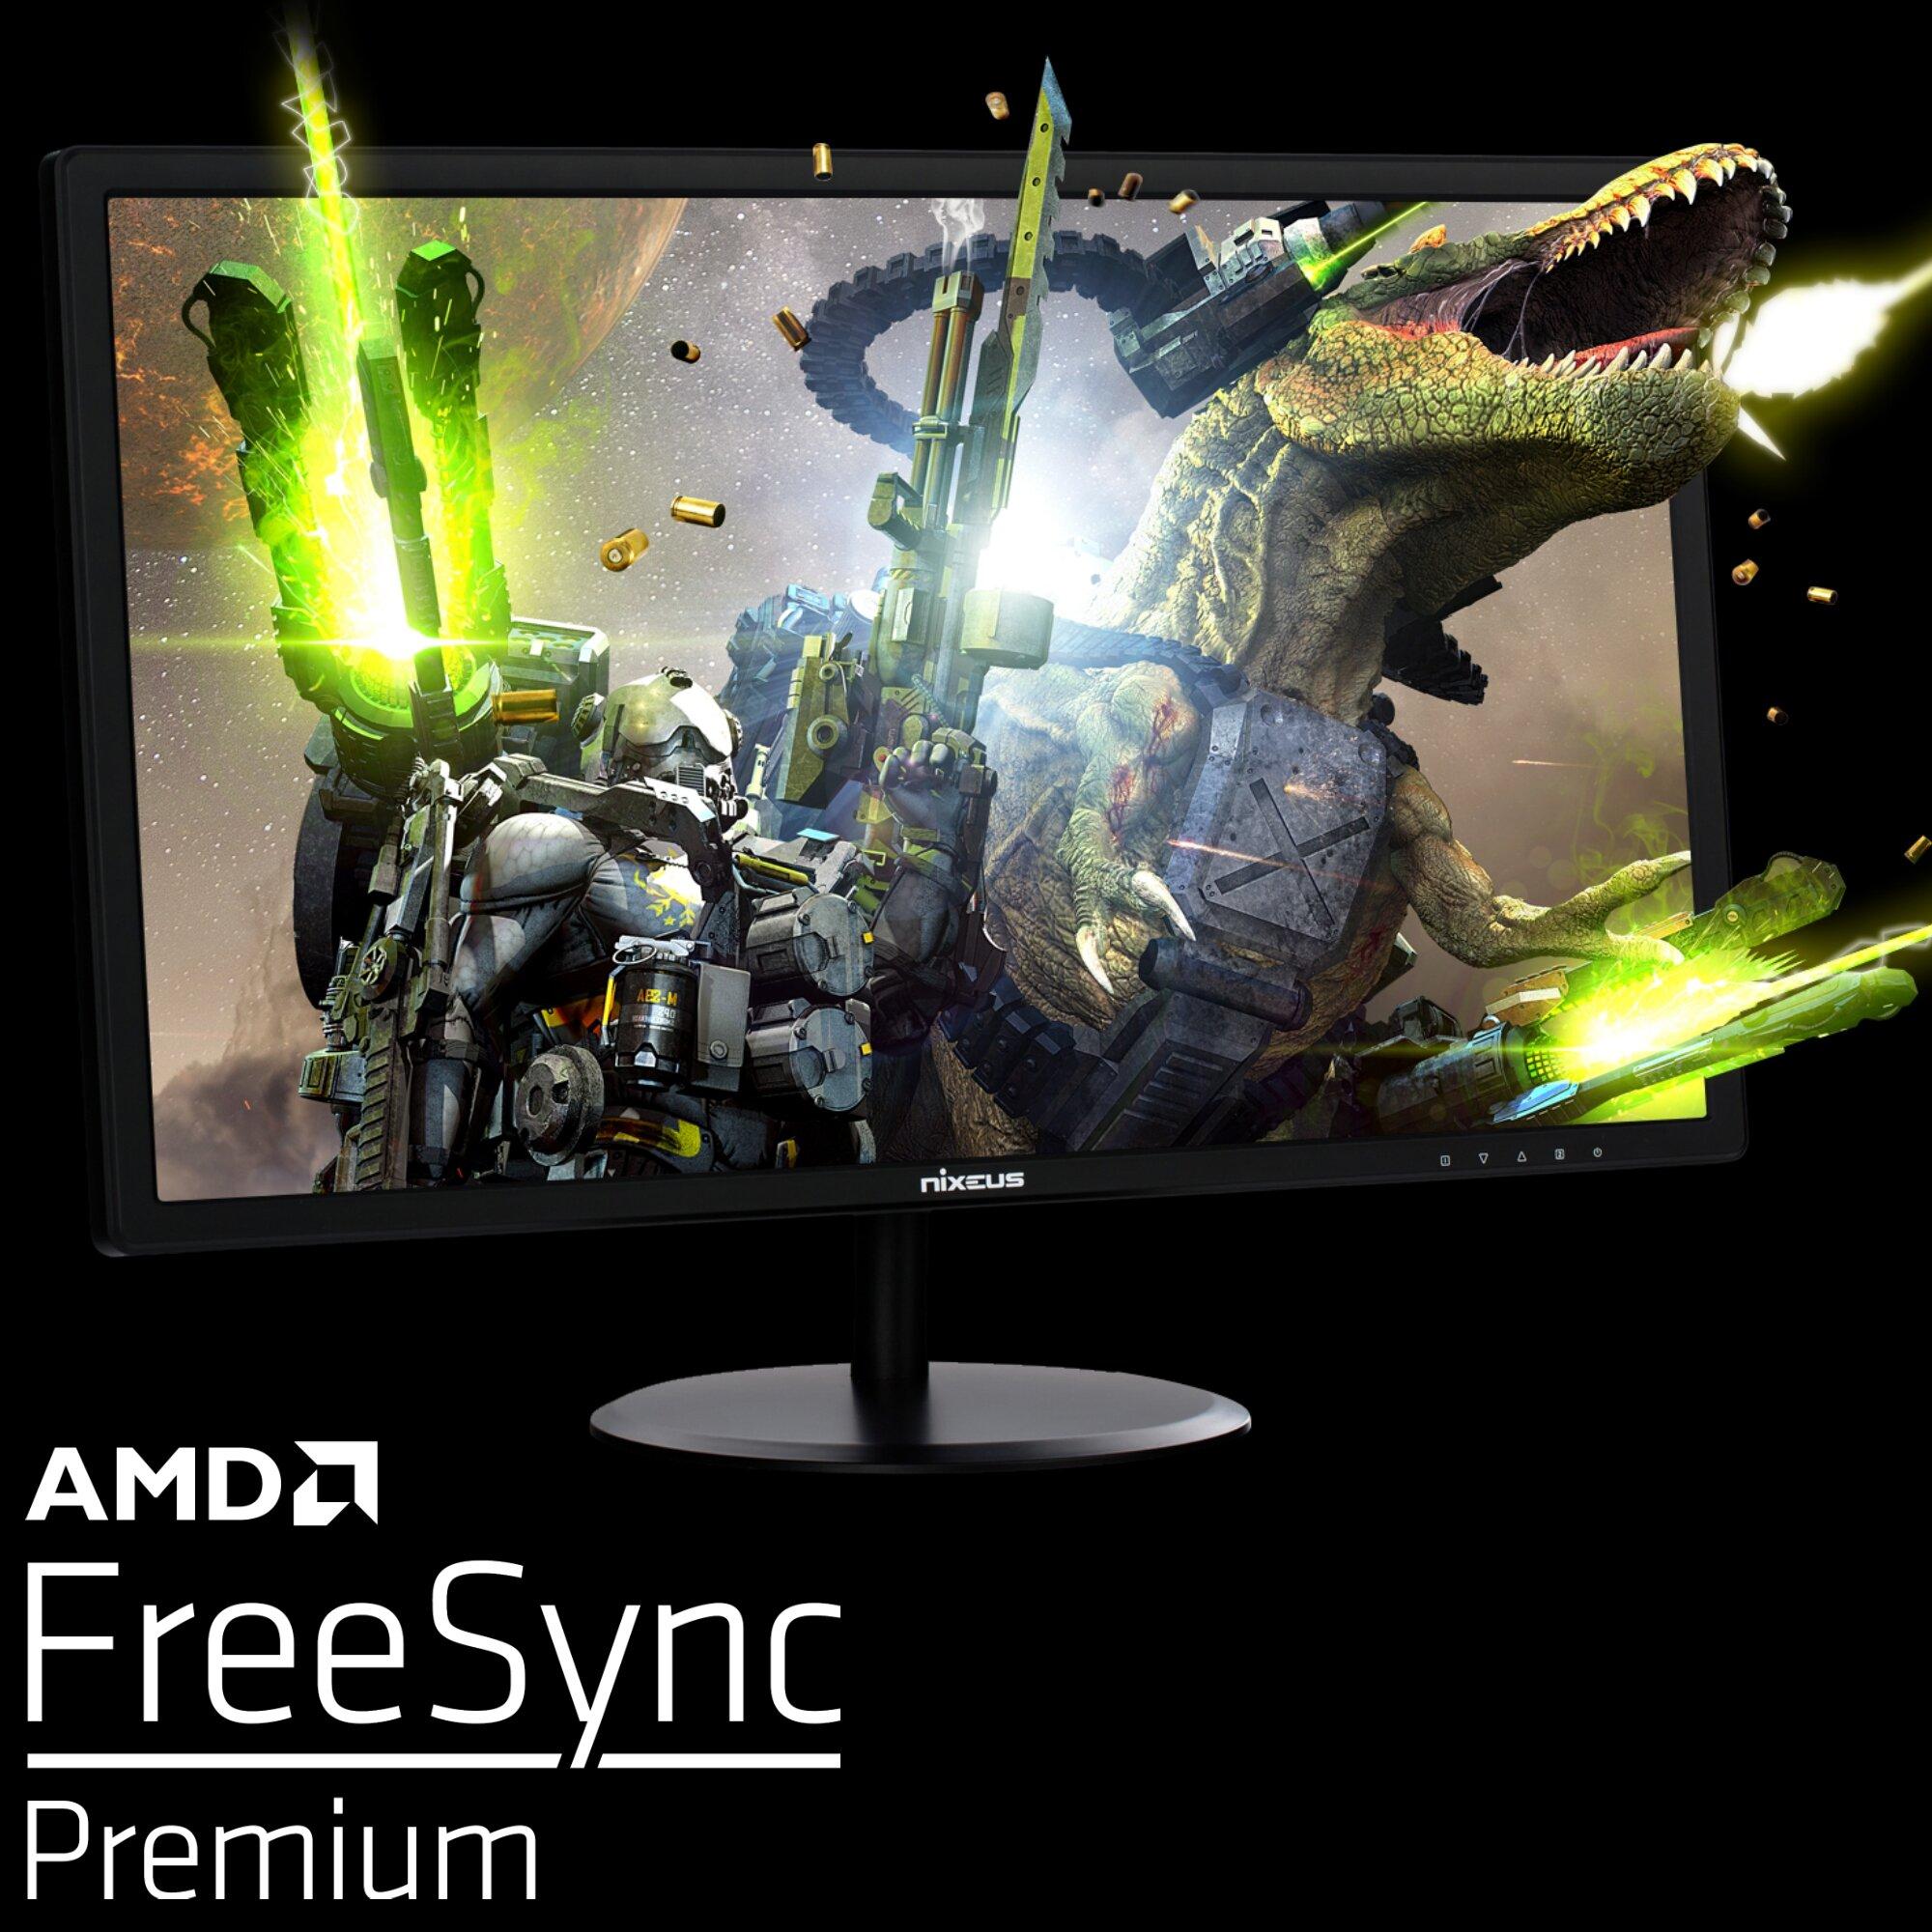 Nixeus Edg 24 1920 X 1080 Amd Radeon Freesync Premium Certified 144hz Gaming Monitor Nixeus